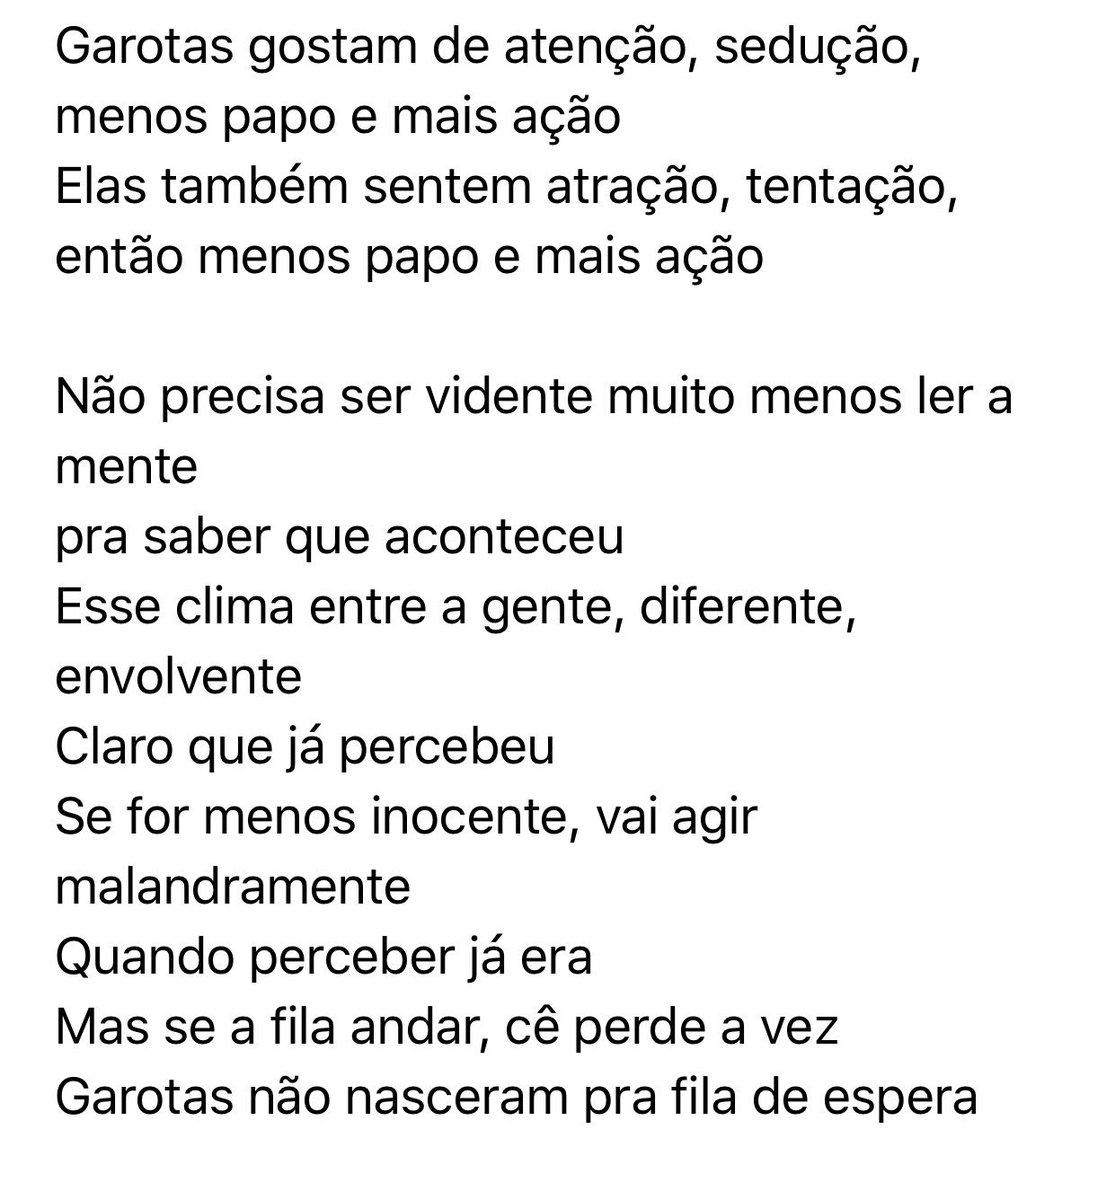 #GarotasNaoMordem